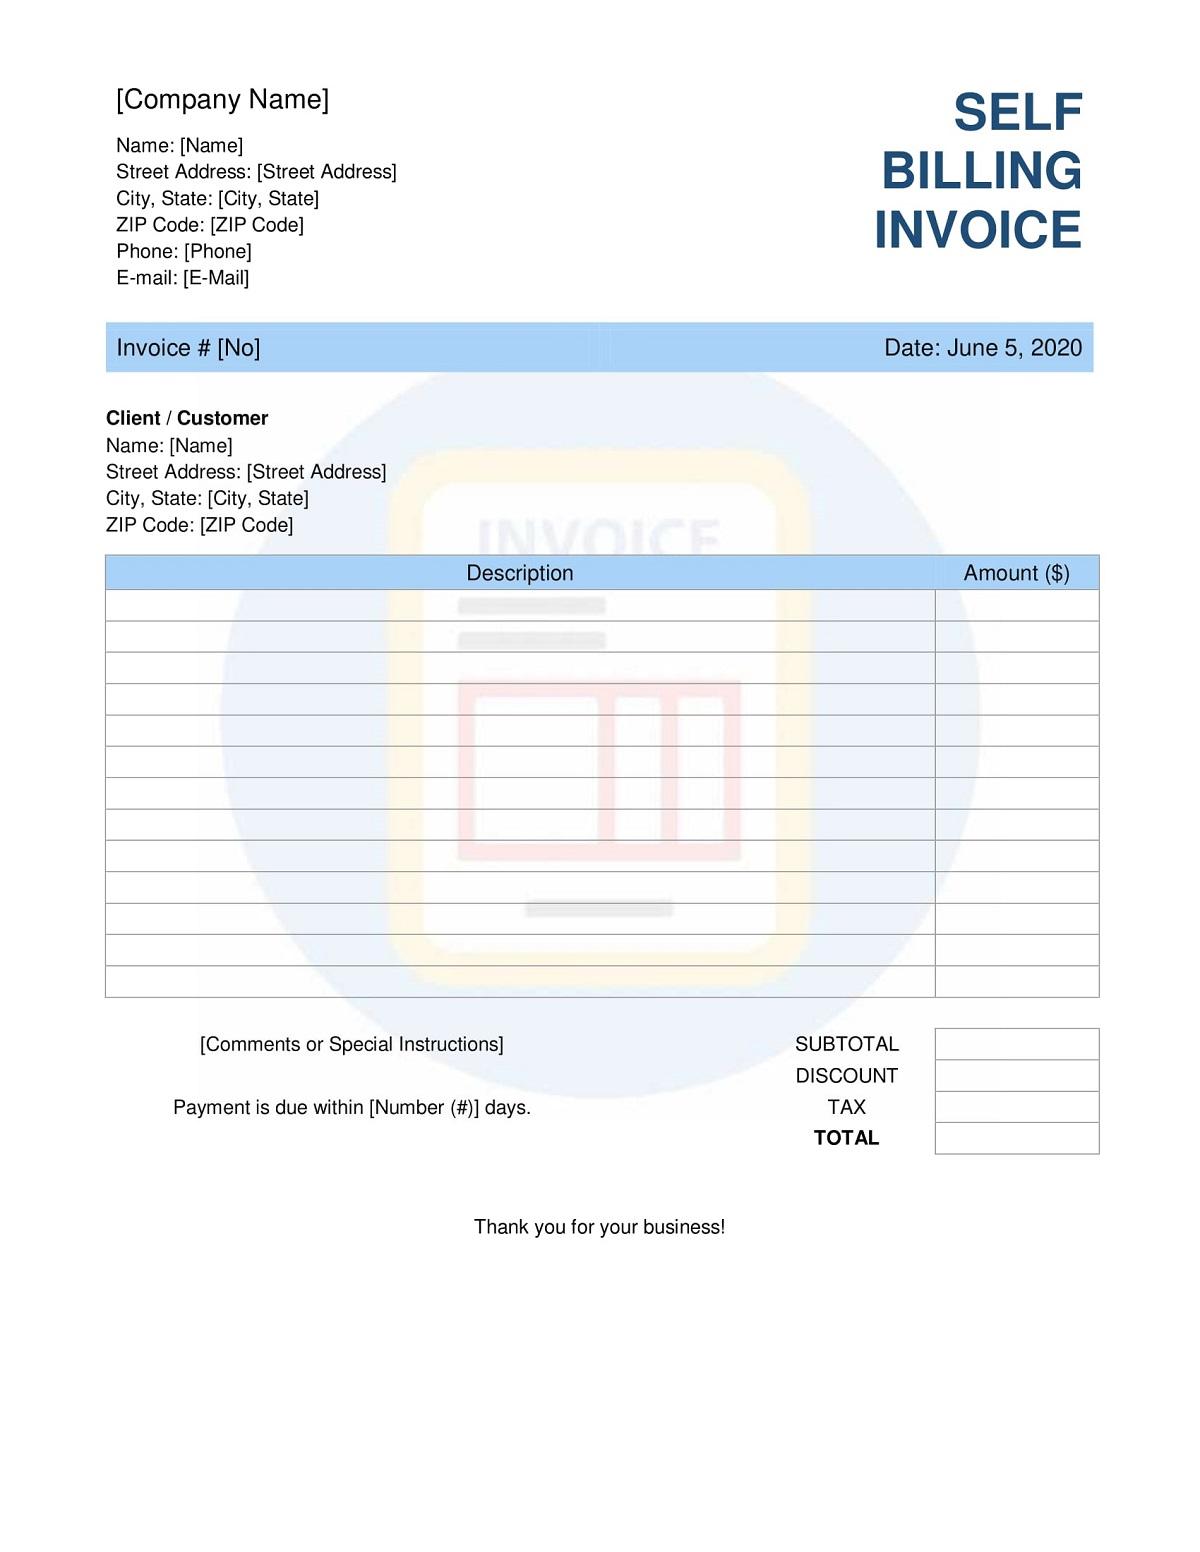 Self-Billing Invoice Format